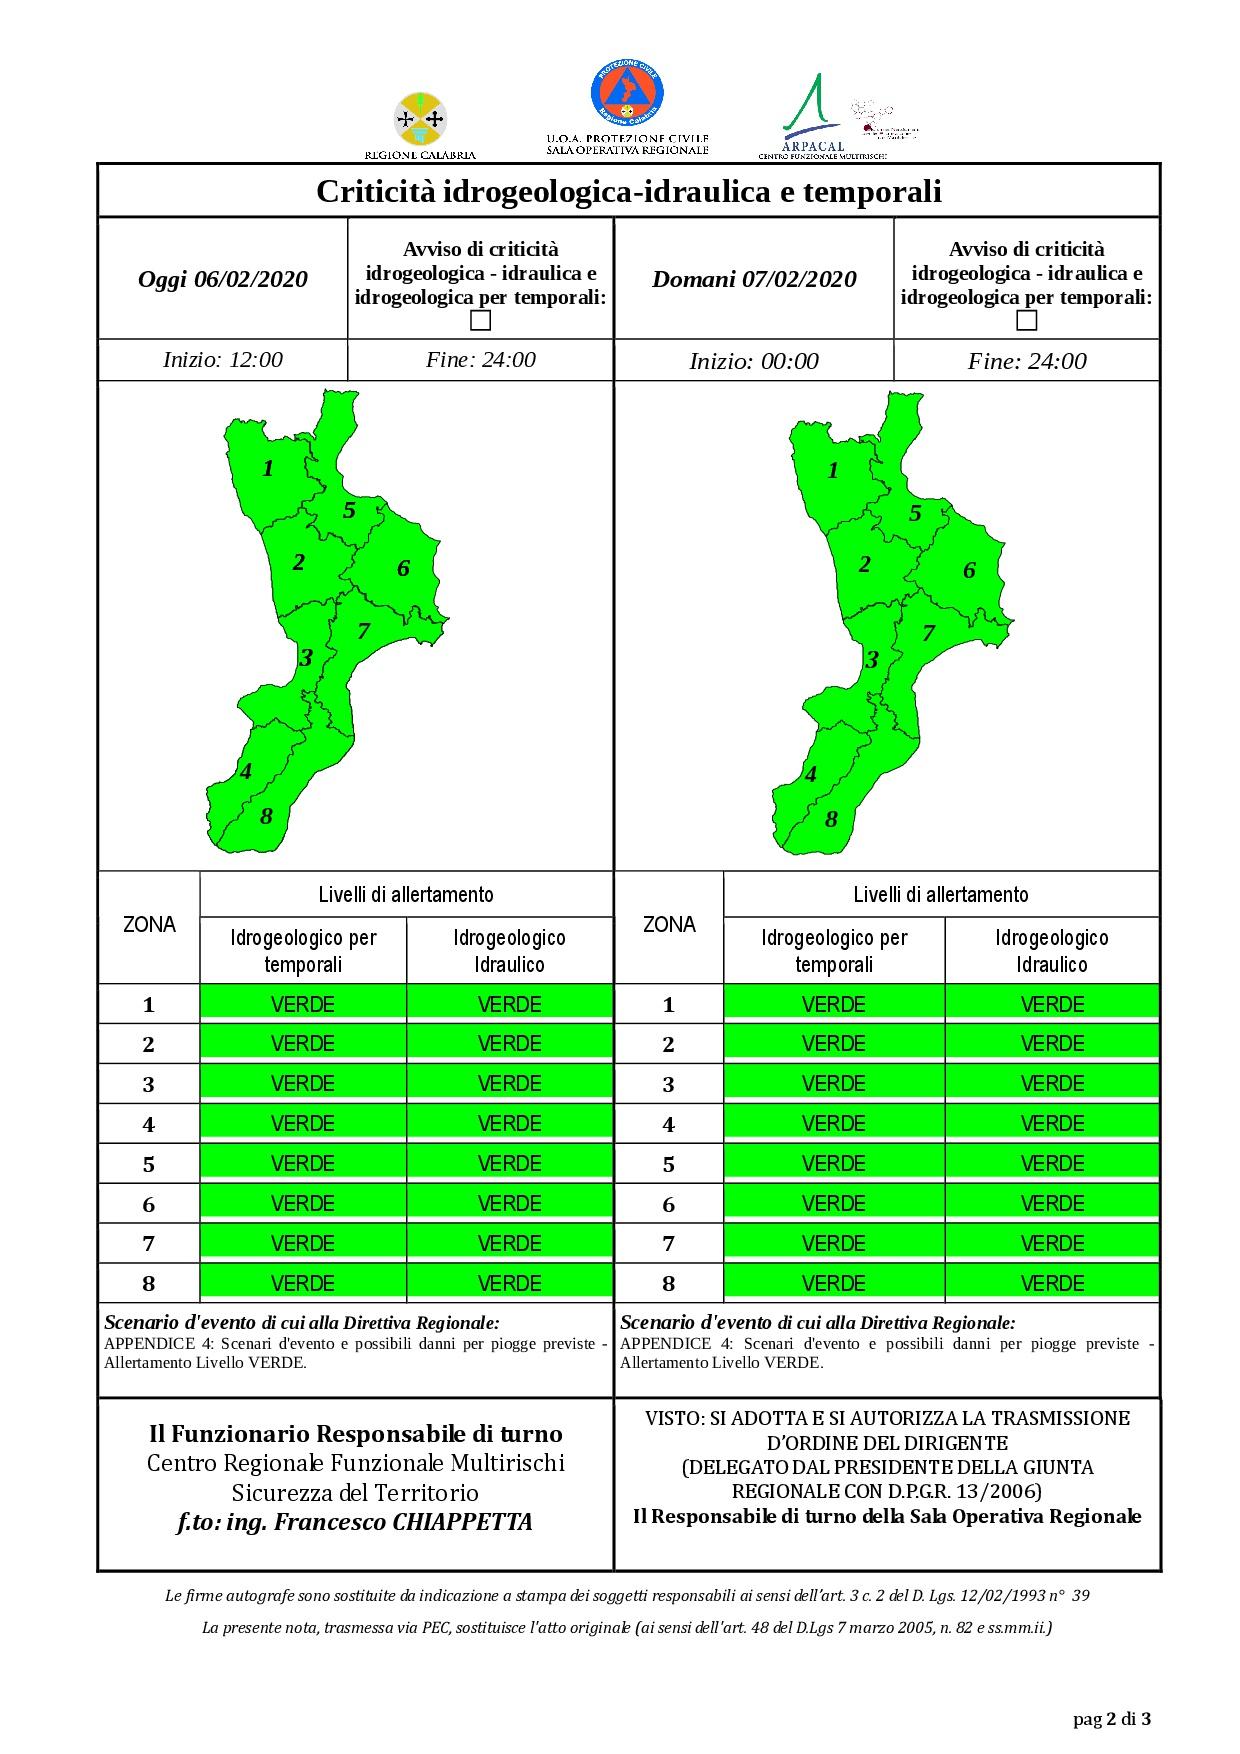 Criticità idrogeologica-idraulica e temporali in Calabria 06-02-2020